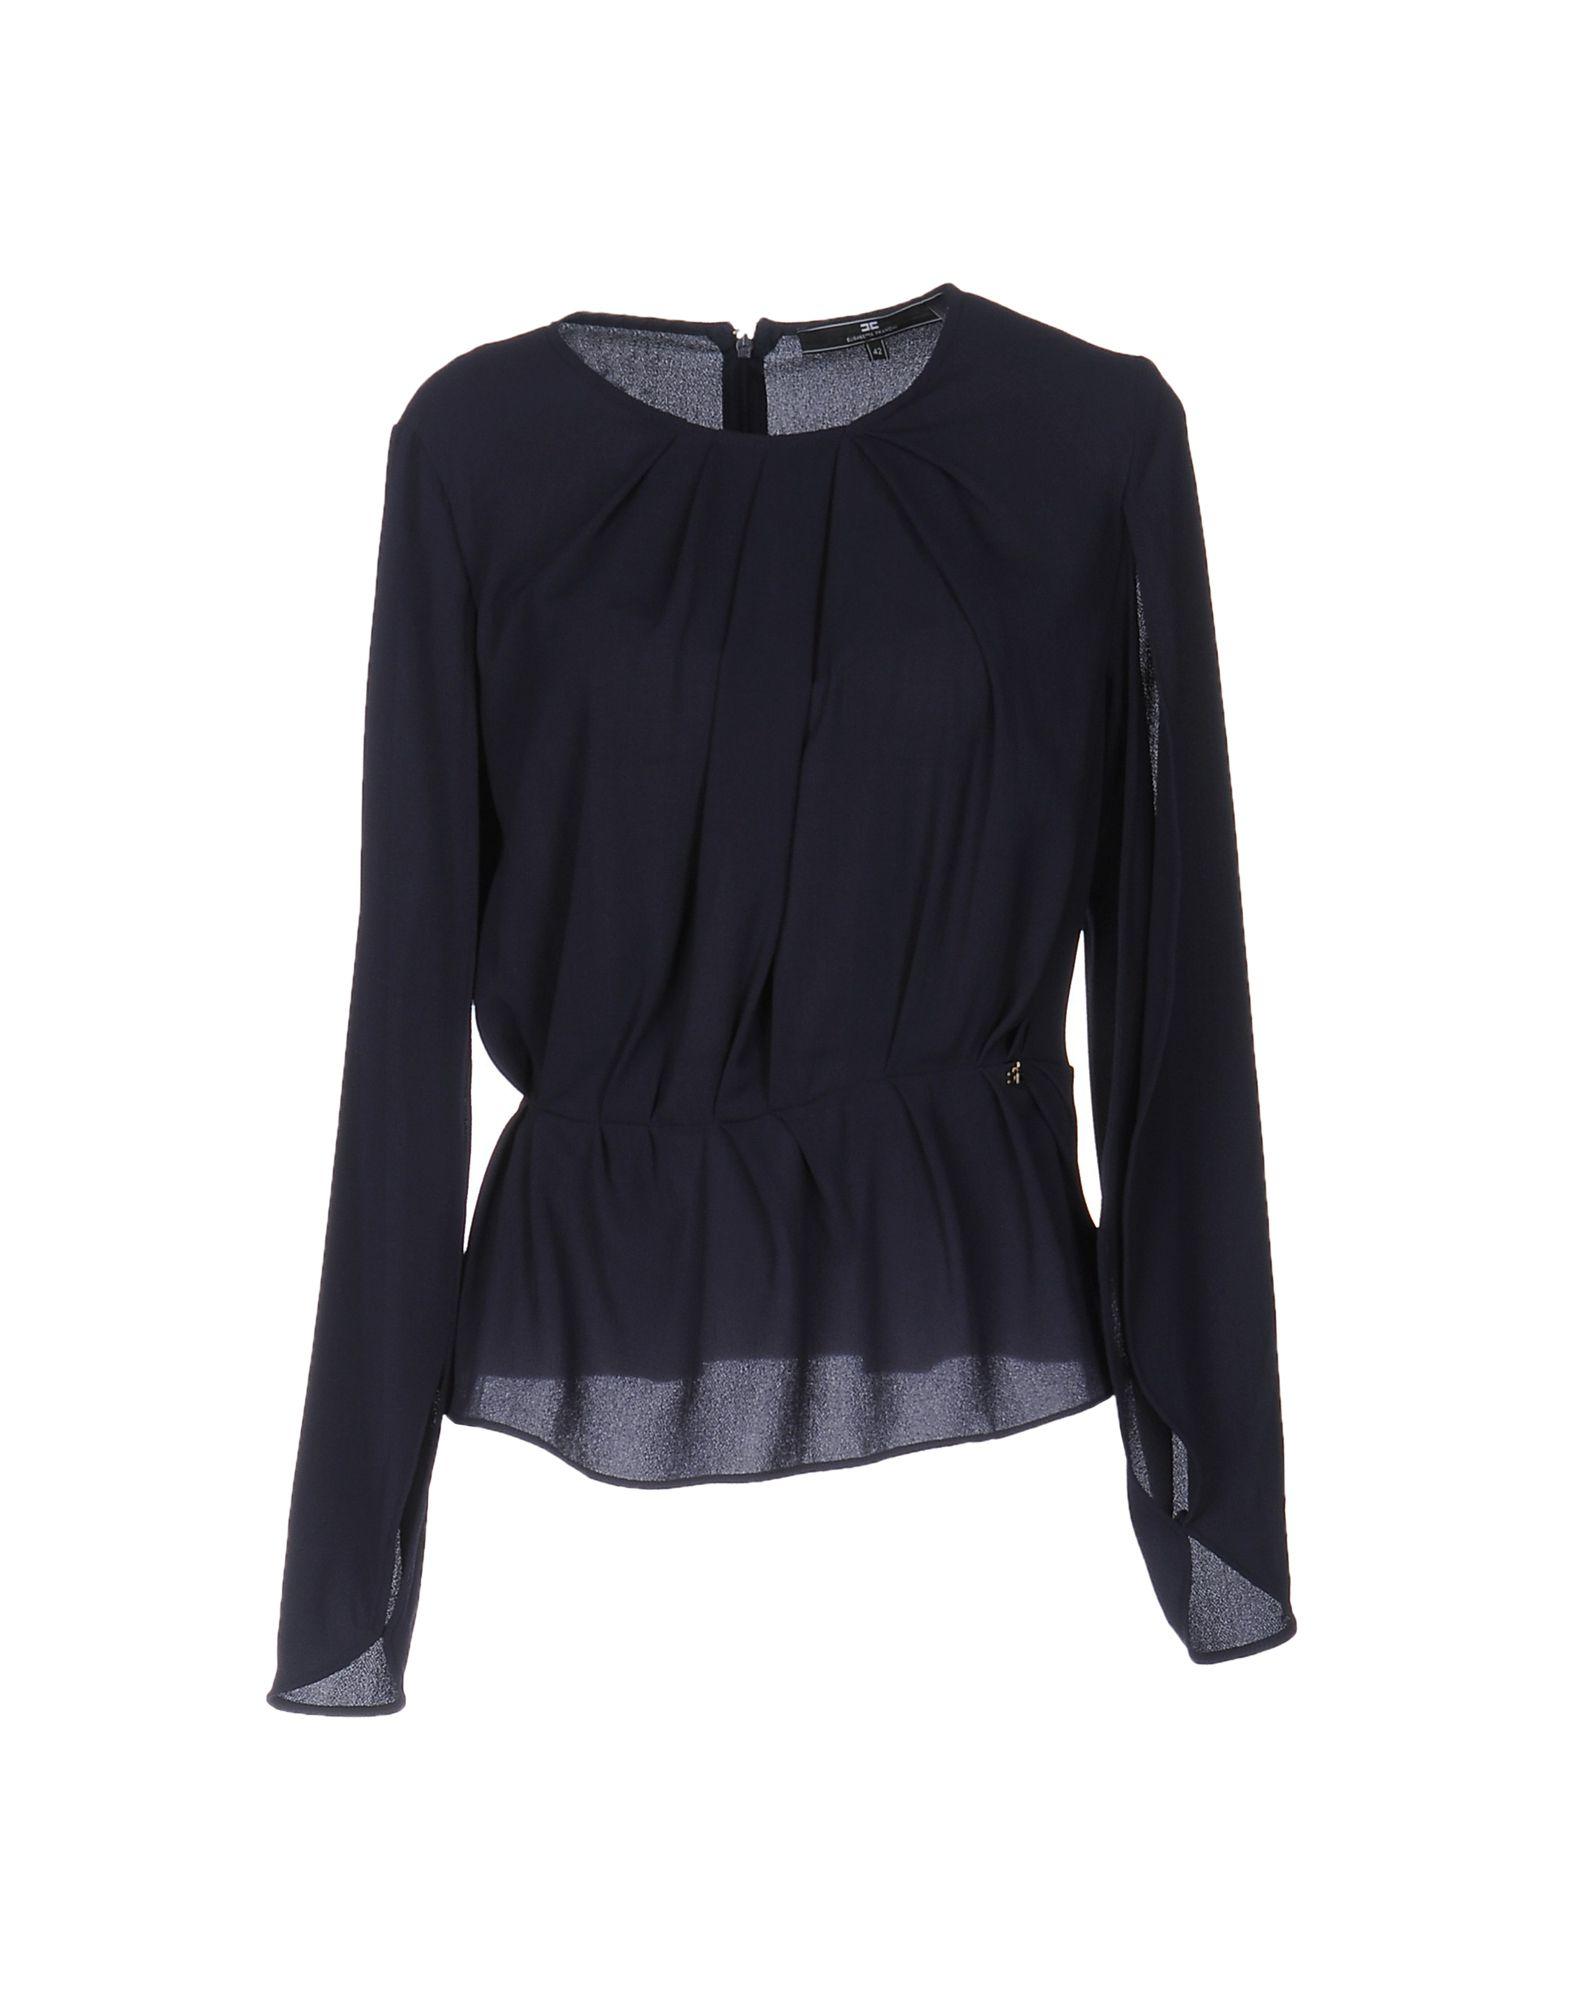 ELISABETTA FRANCHI 24 ORE Блузка цена и фото